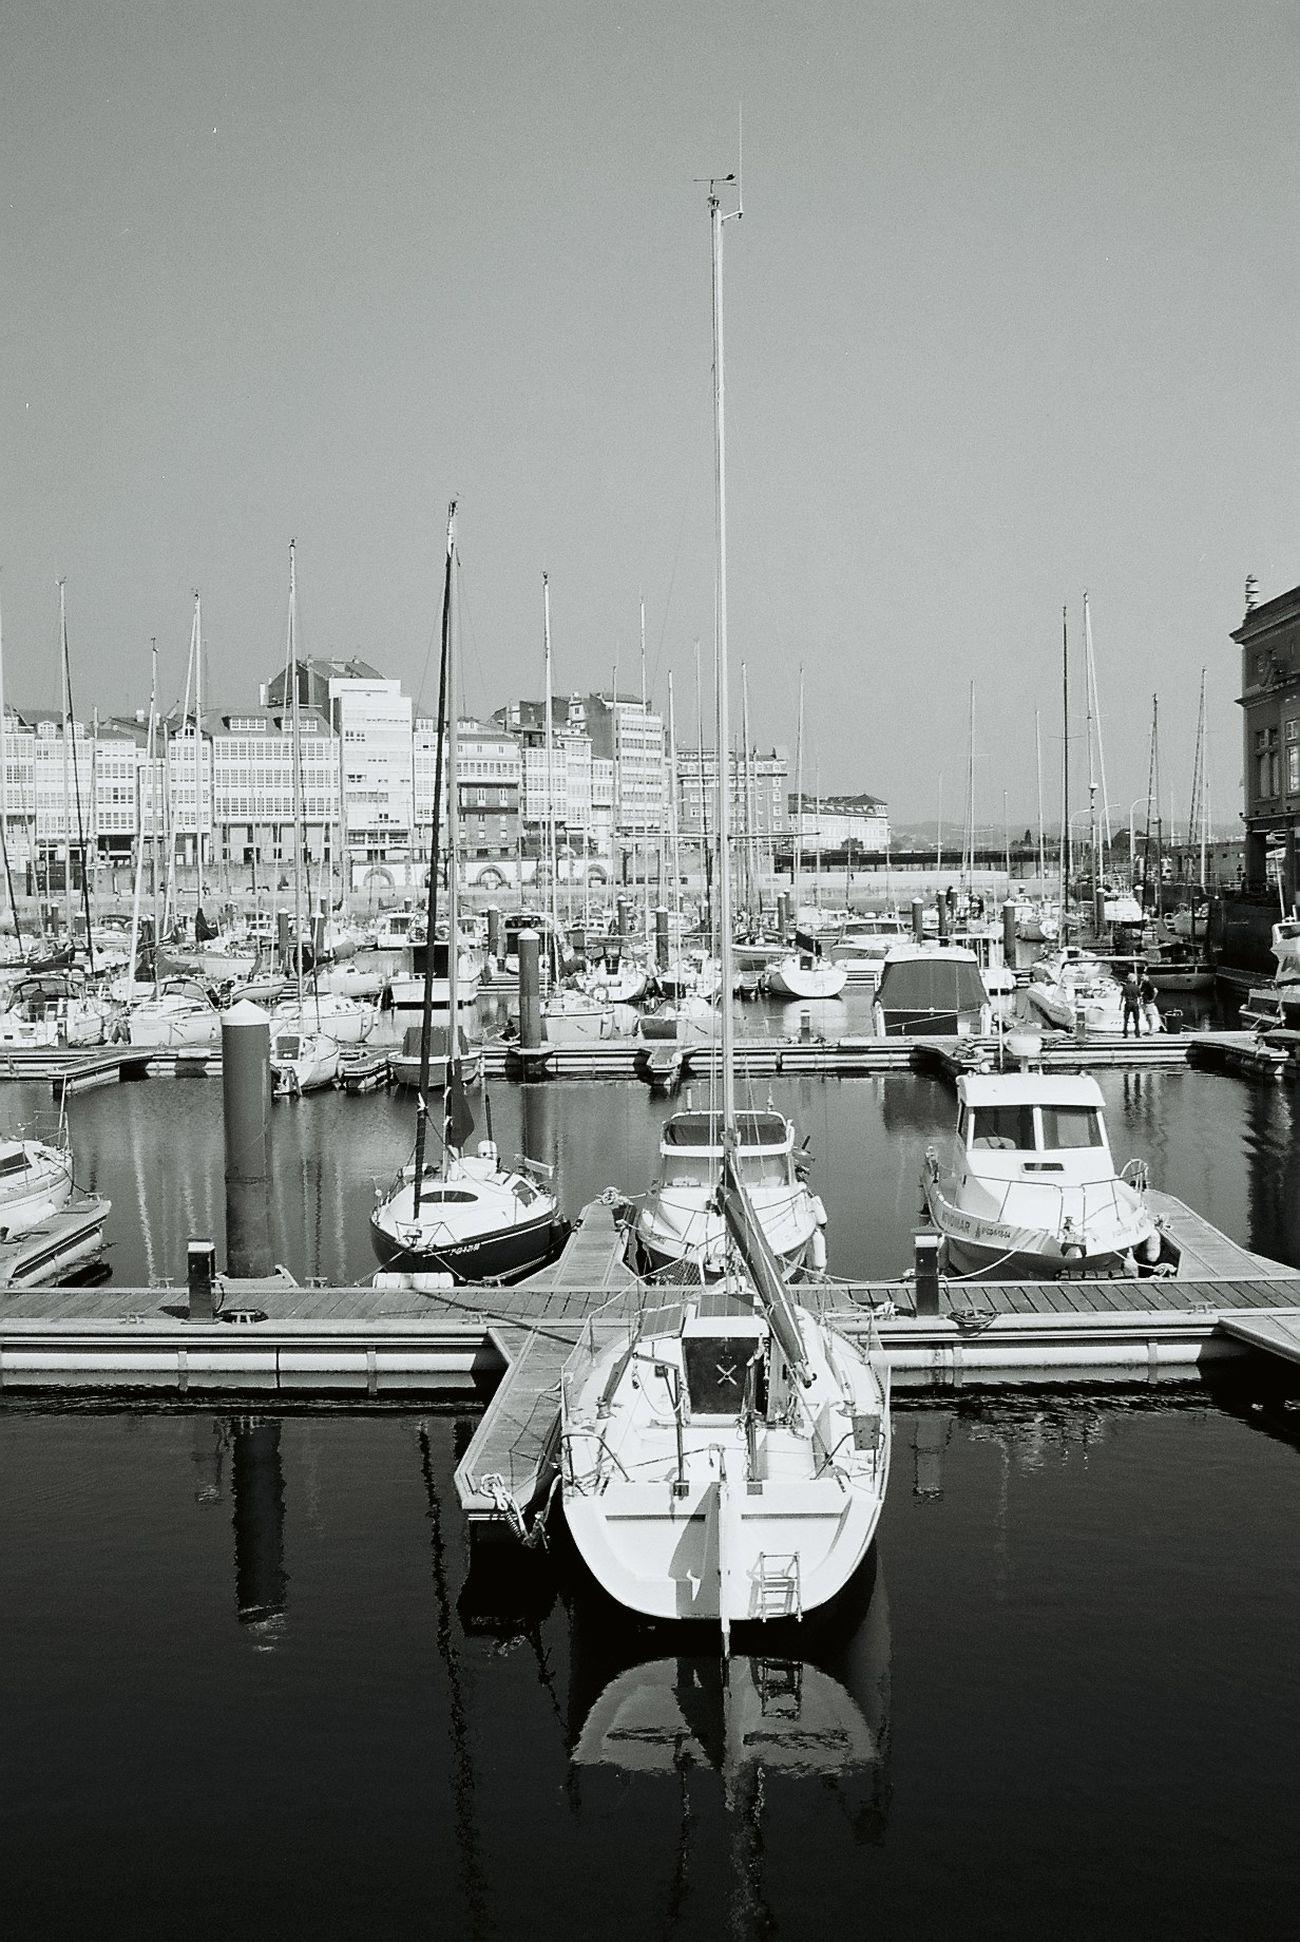 Puerto Coruña. Analogicphotography Yashicafx3super2000